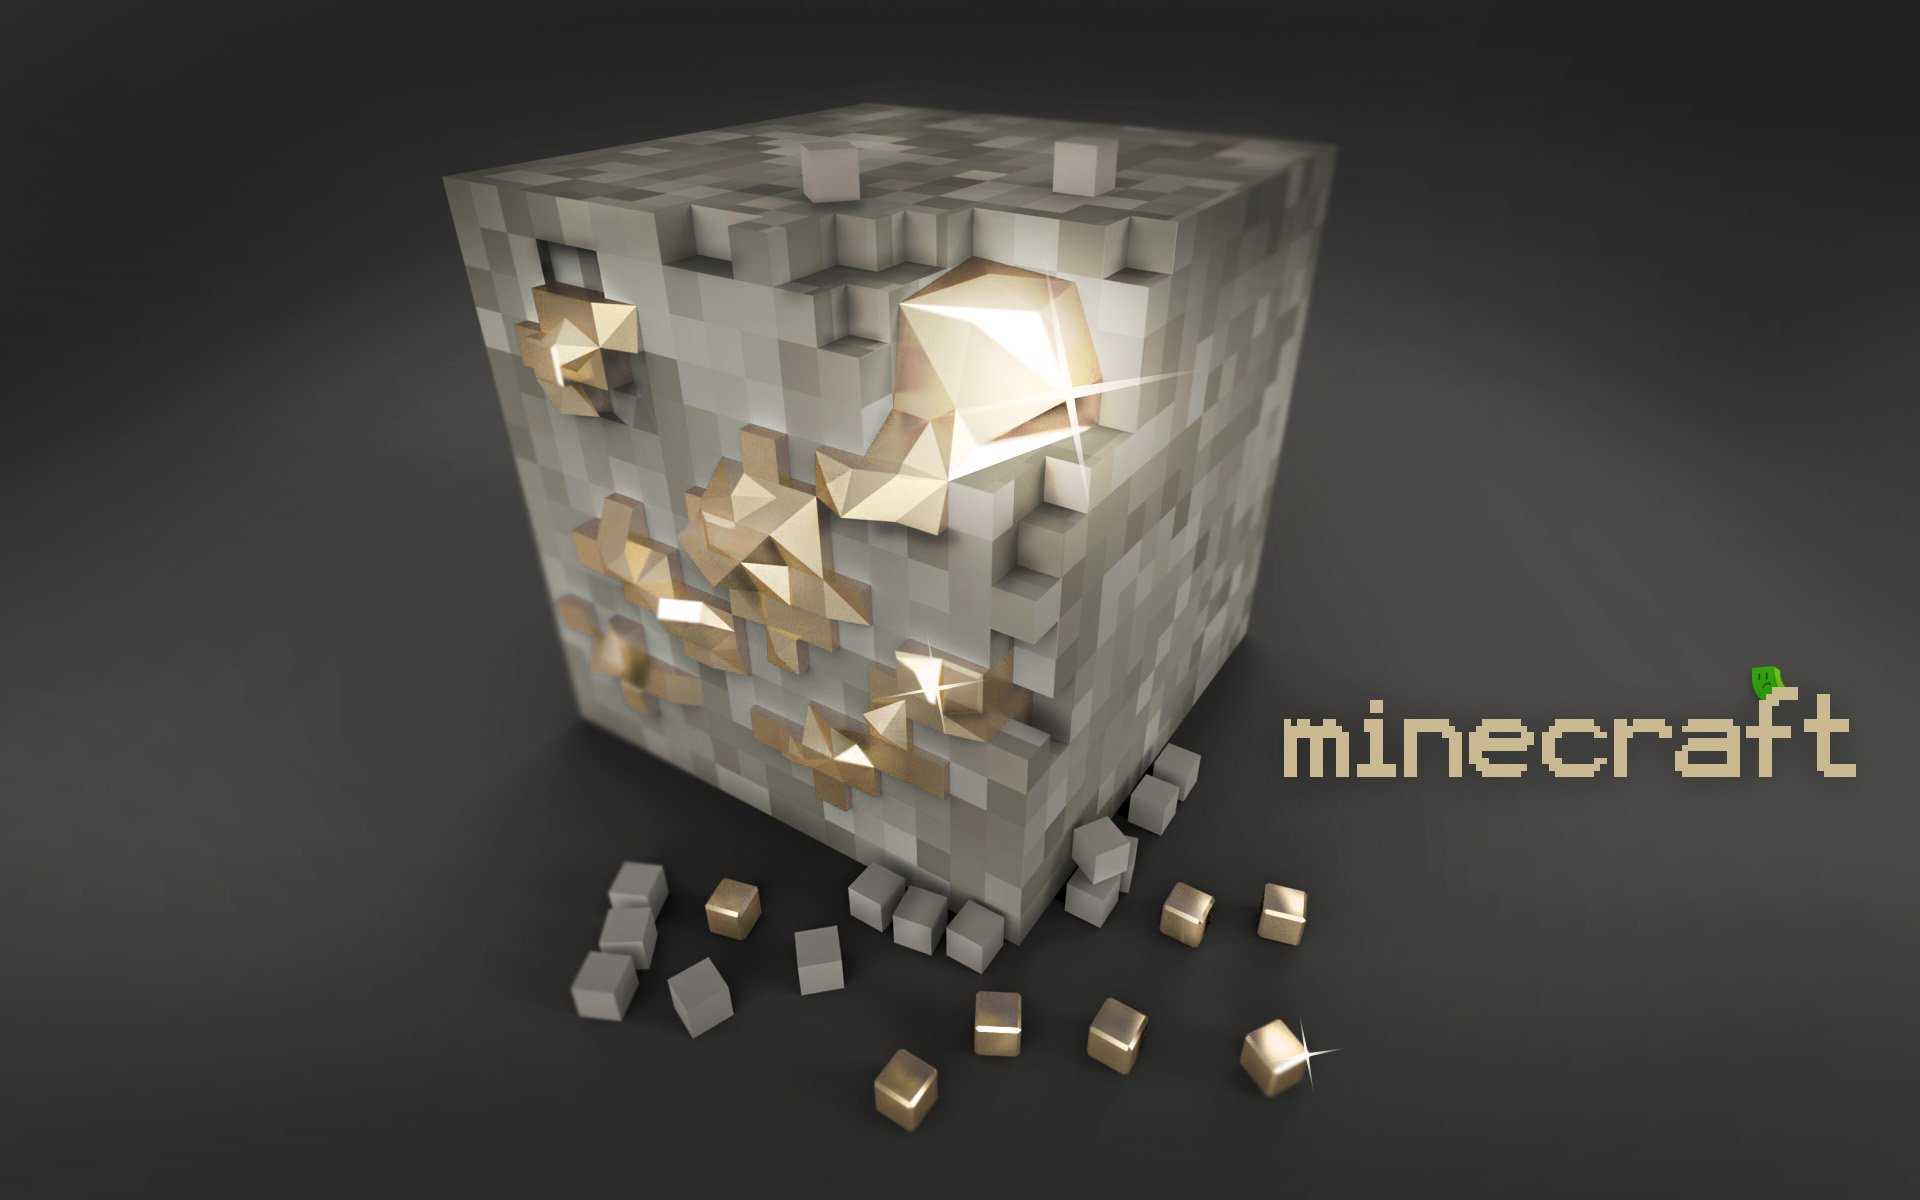 minecraft gold wallpaper paper pictures jocuri 1920x1200